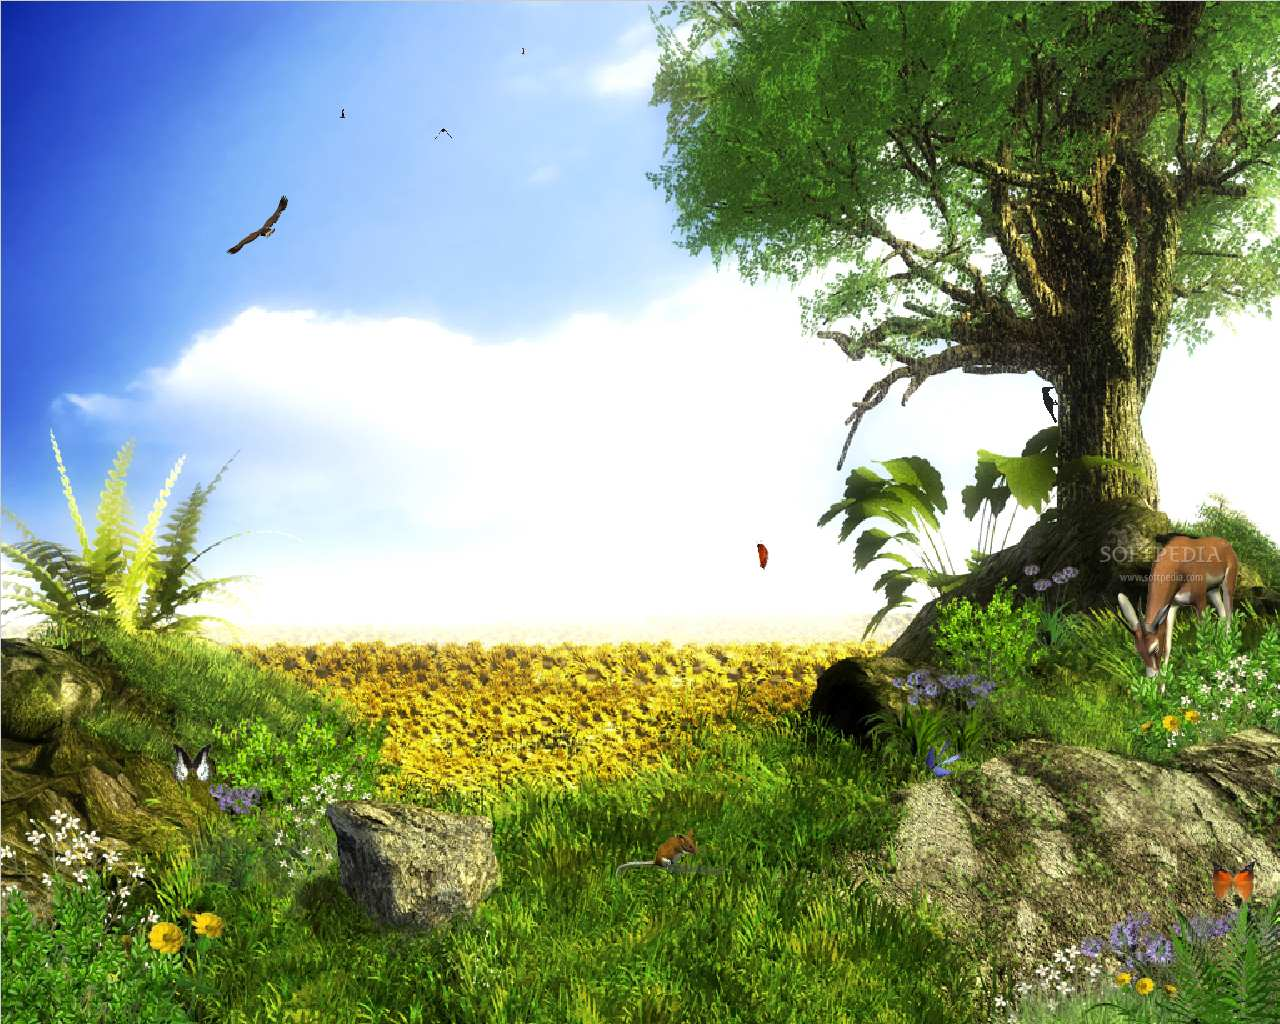 beautiful wallpaper: 3d Animated Desktop, Free Animated Desktop Wallpaper for Mac, 3d Animated ...